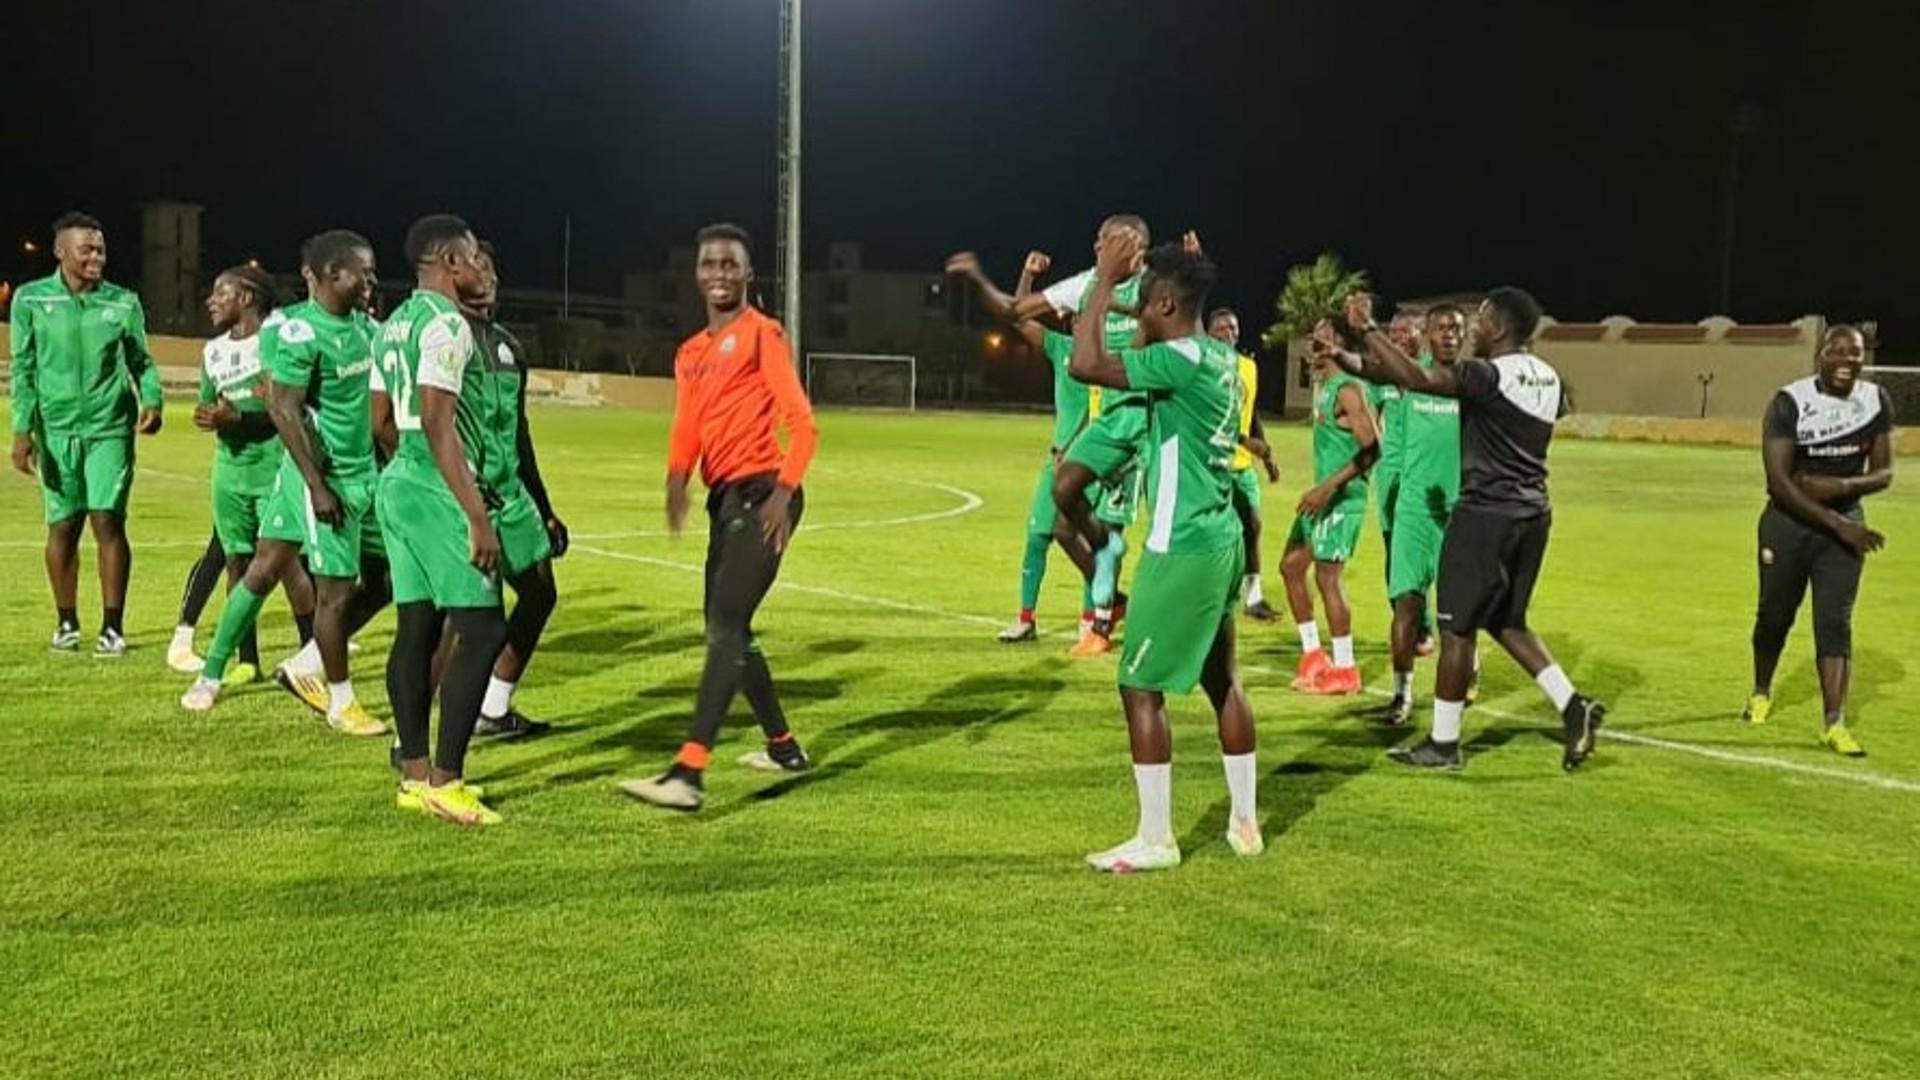 Caf Confederation Cup: Omondi and key players for Gor Mahia against Al-Ahly Merowe